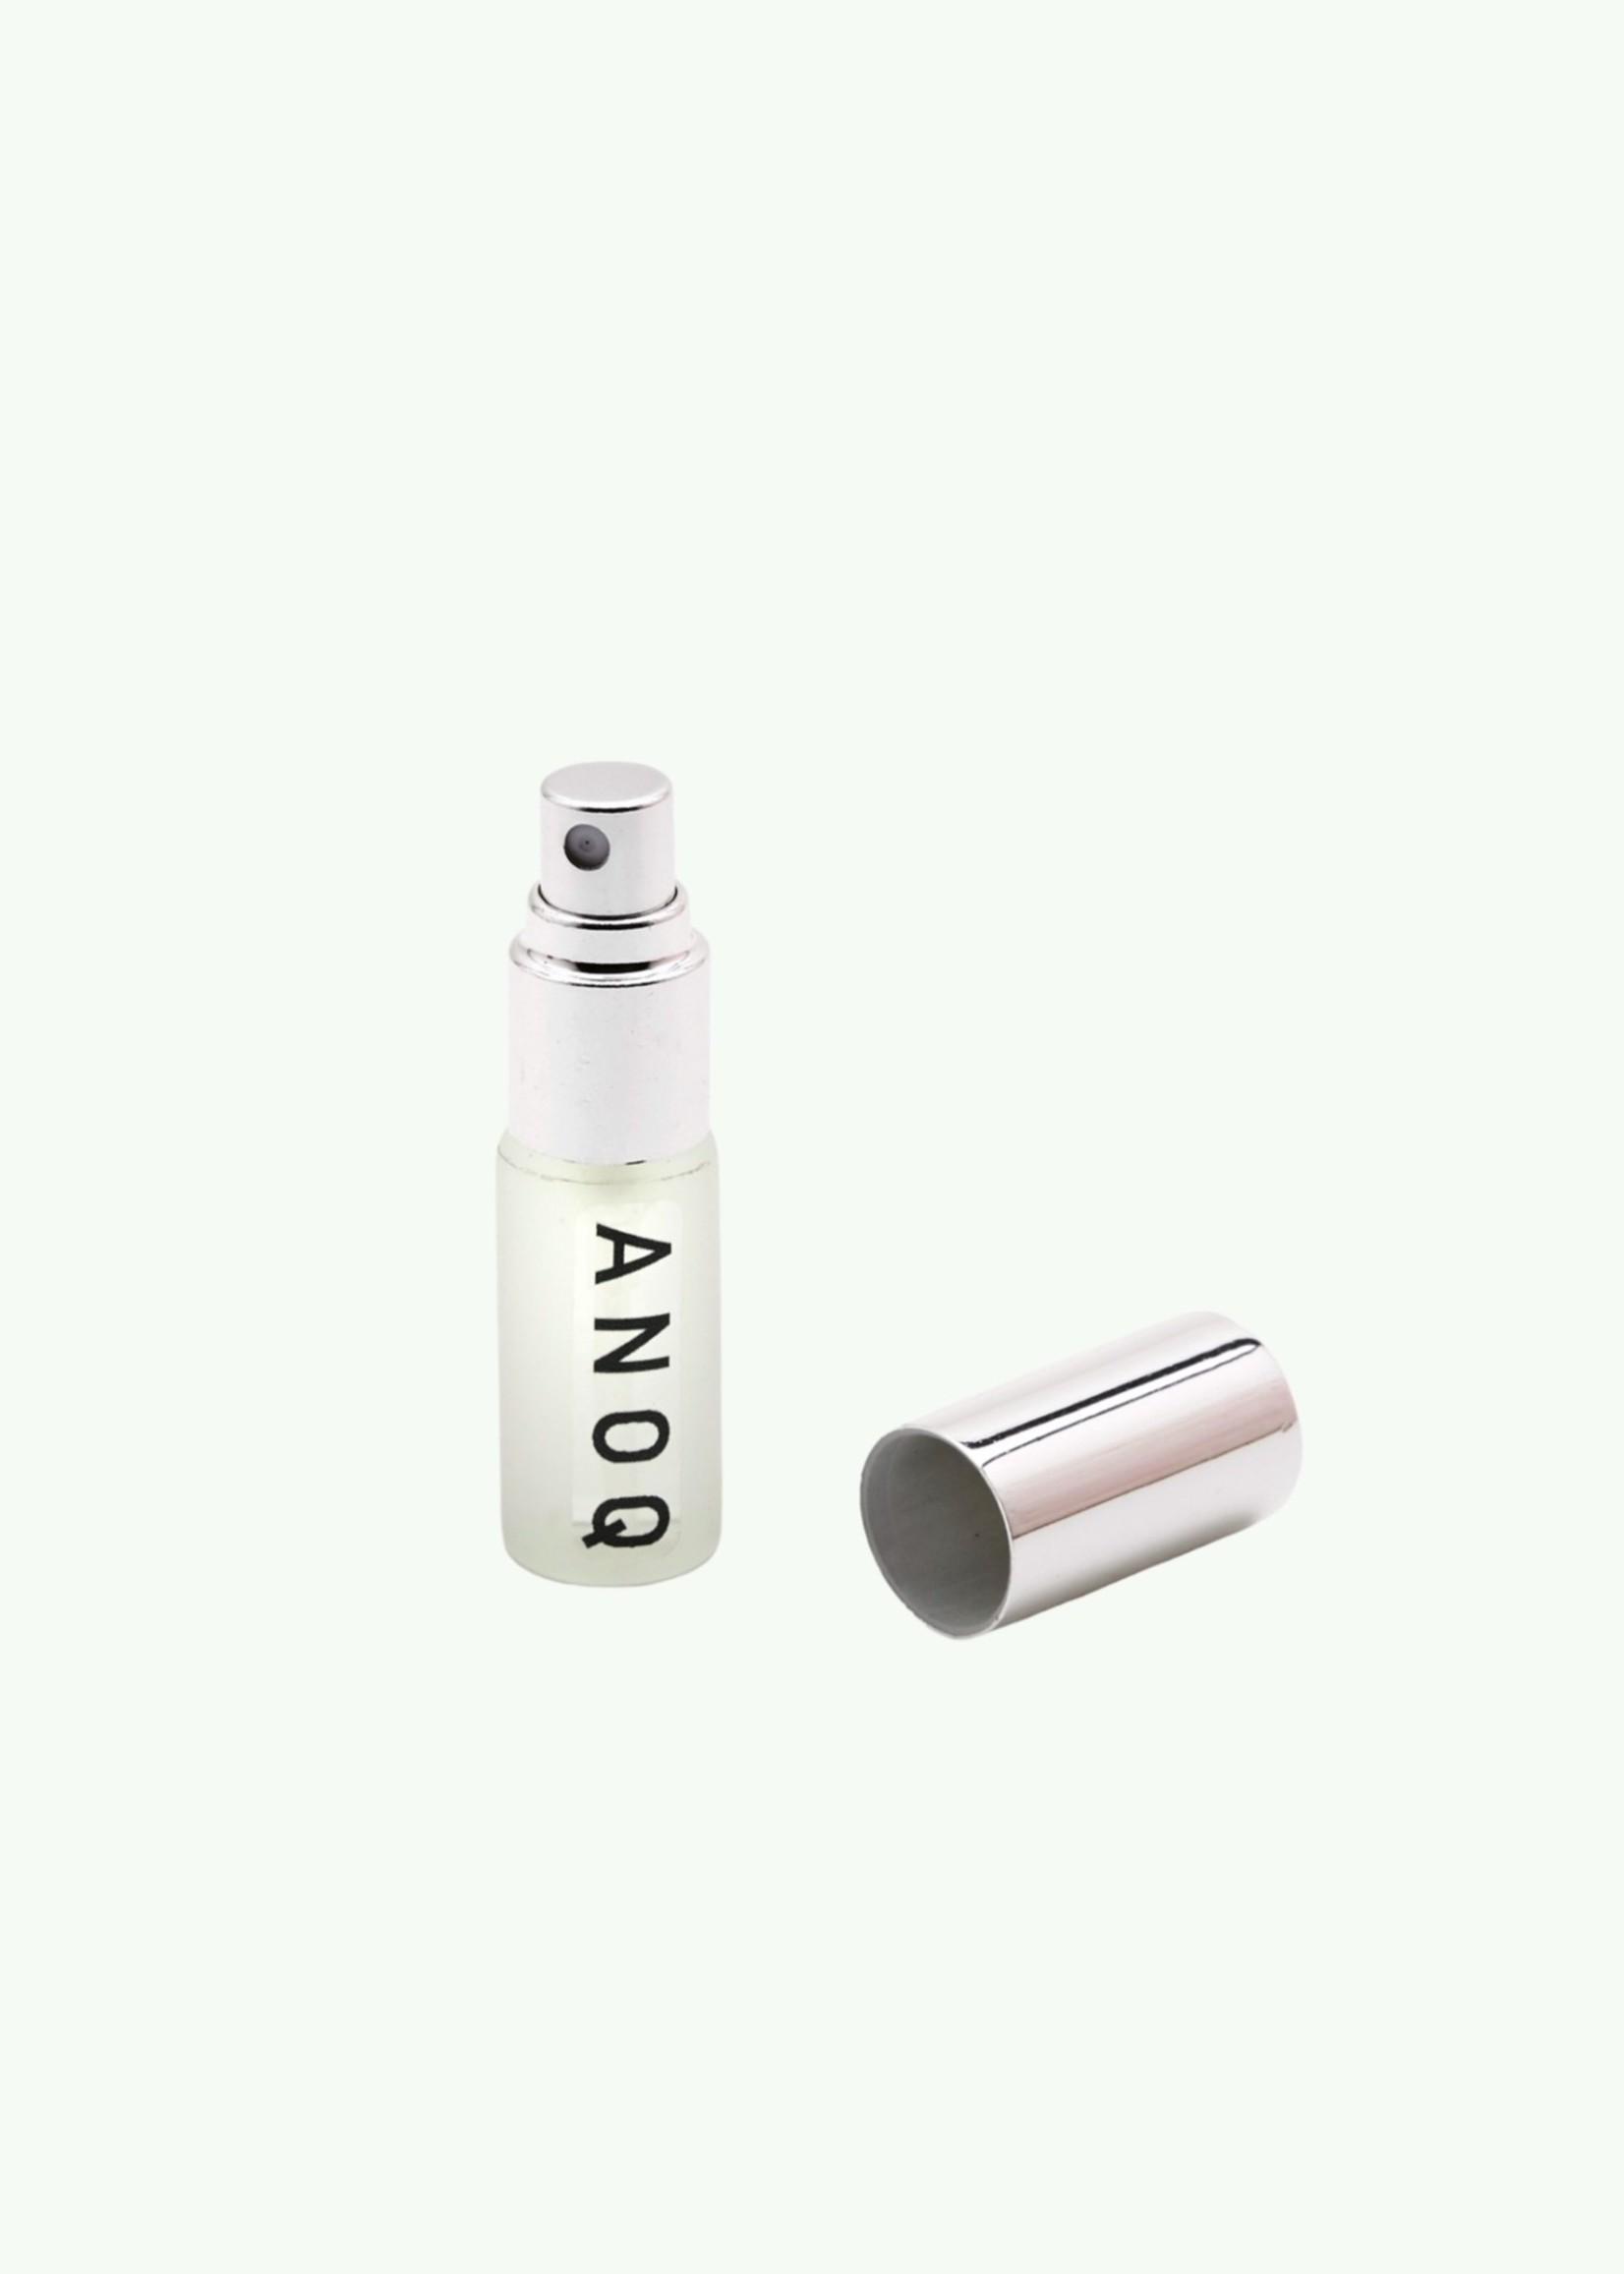 Anoq Anoq - Perfume Spray 5 ml